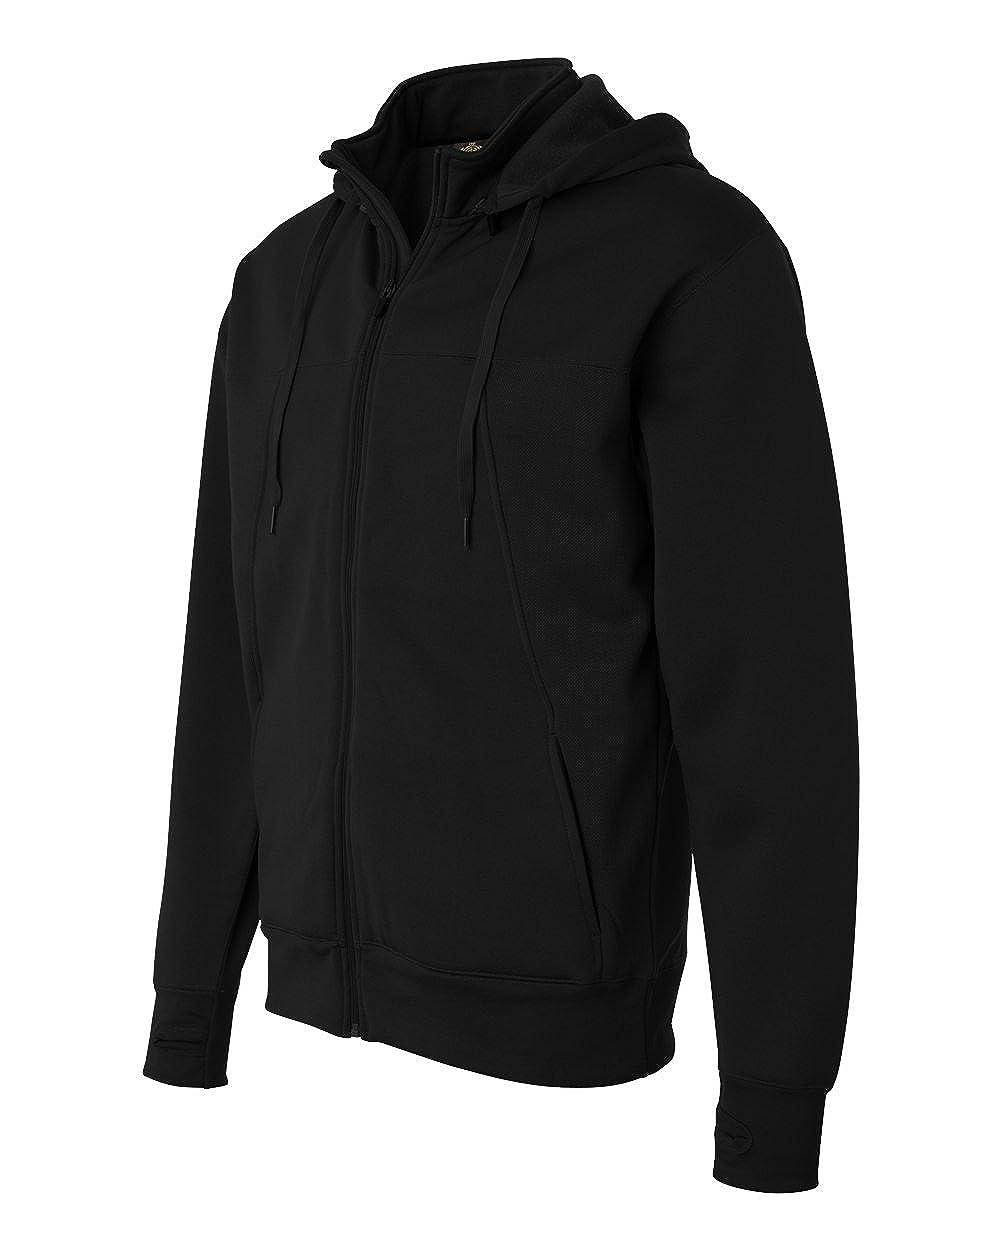 M Mens Hi-Tech Full-Zip Hooded Sweatshirt Independent Trading Co Black